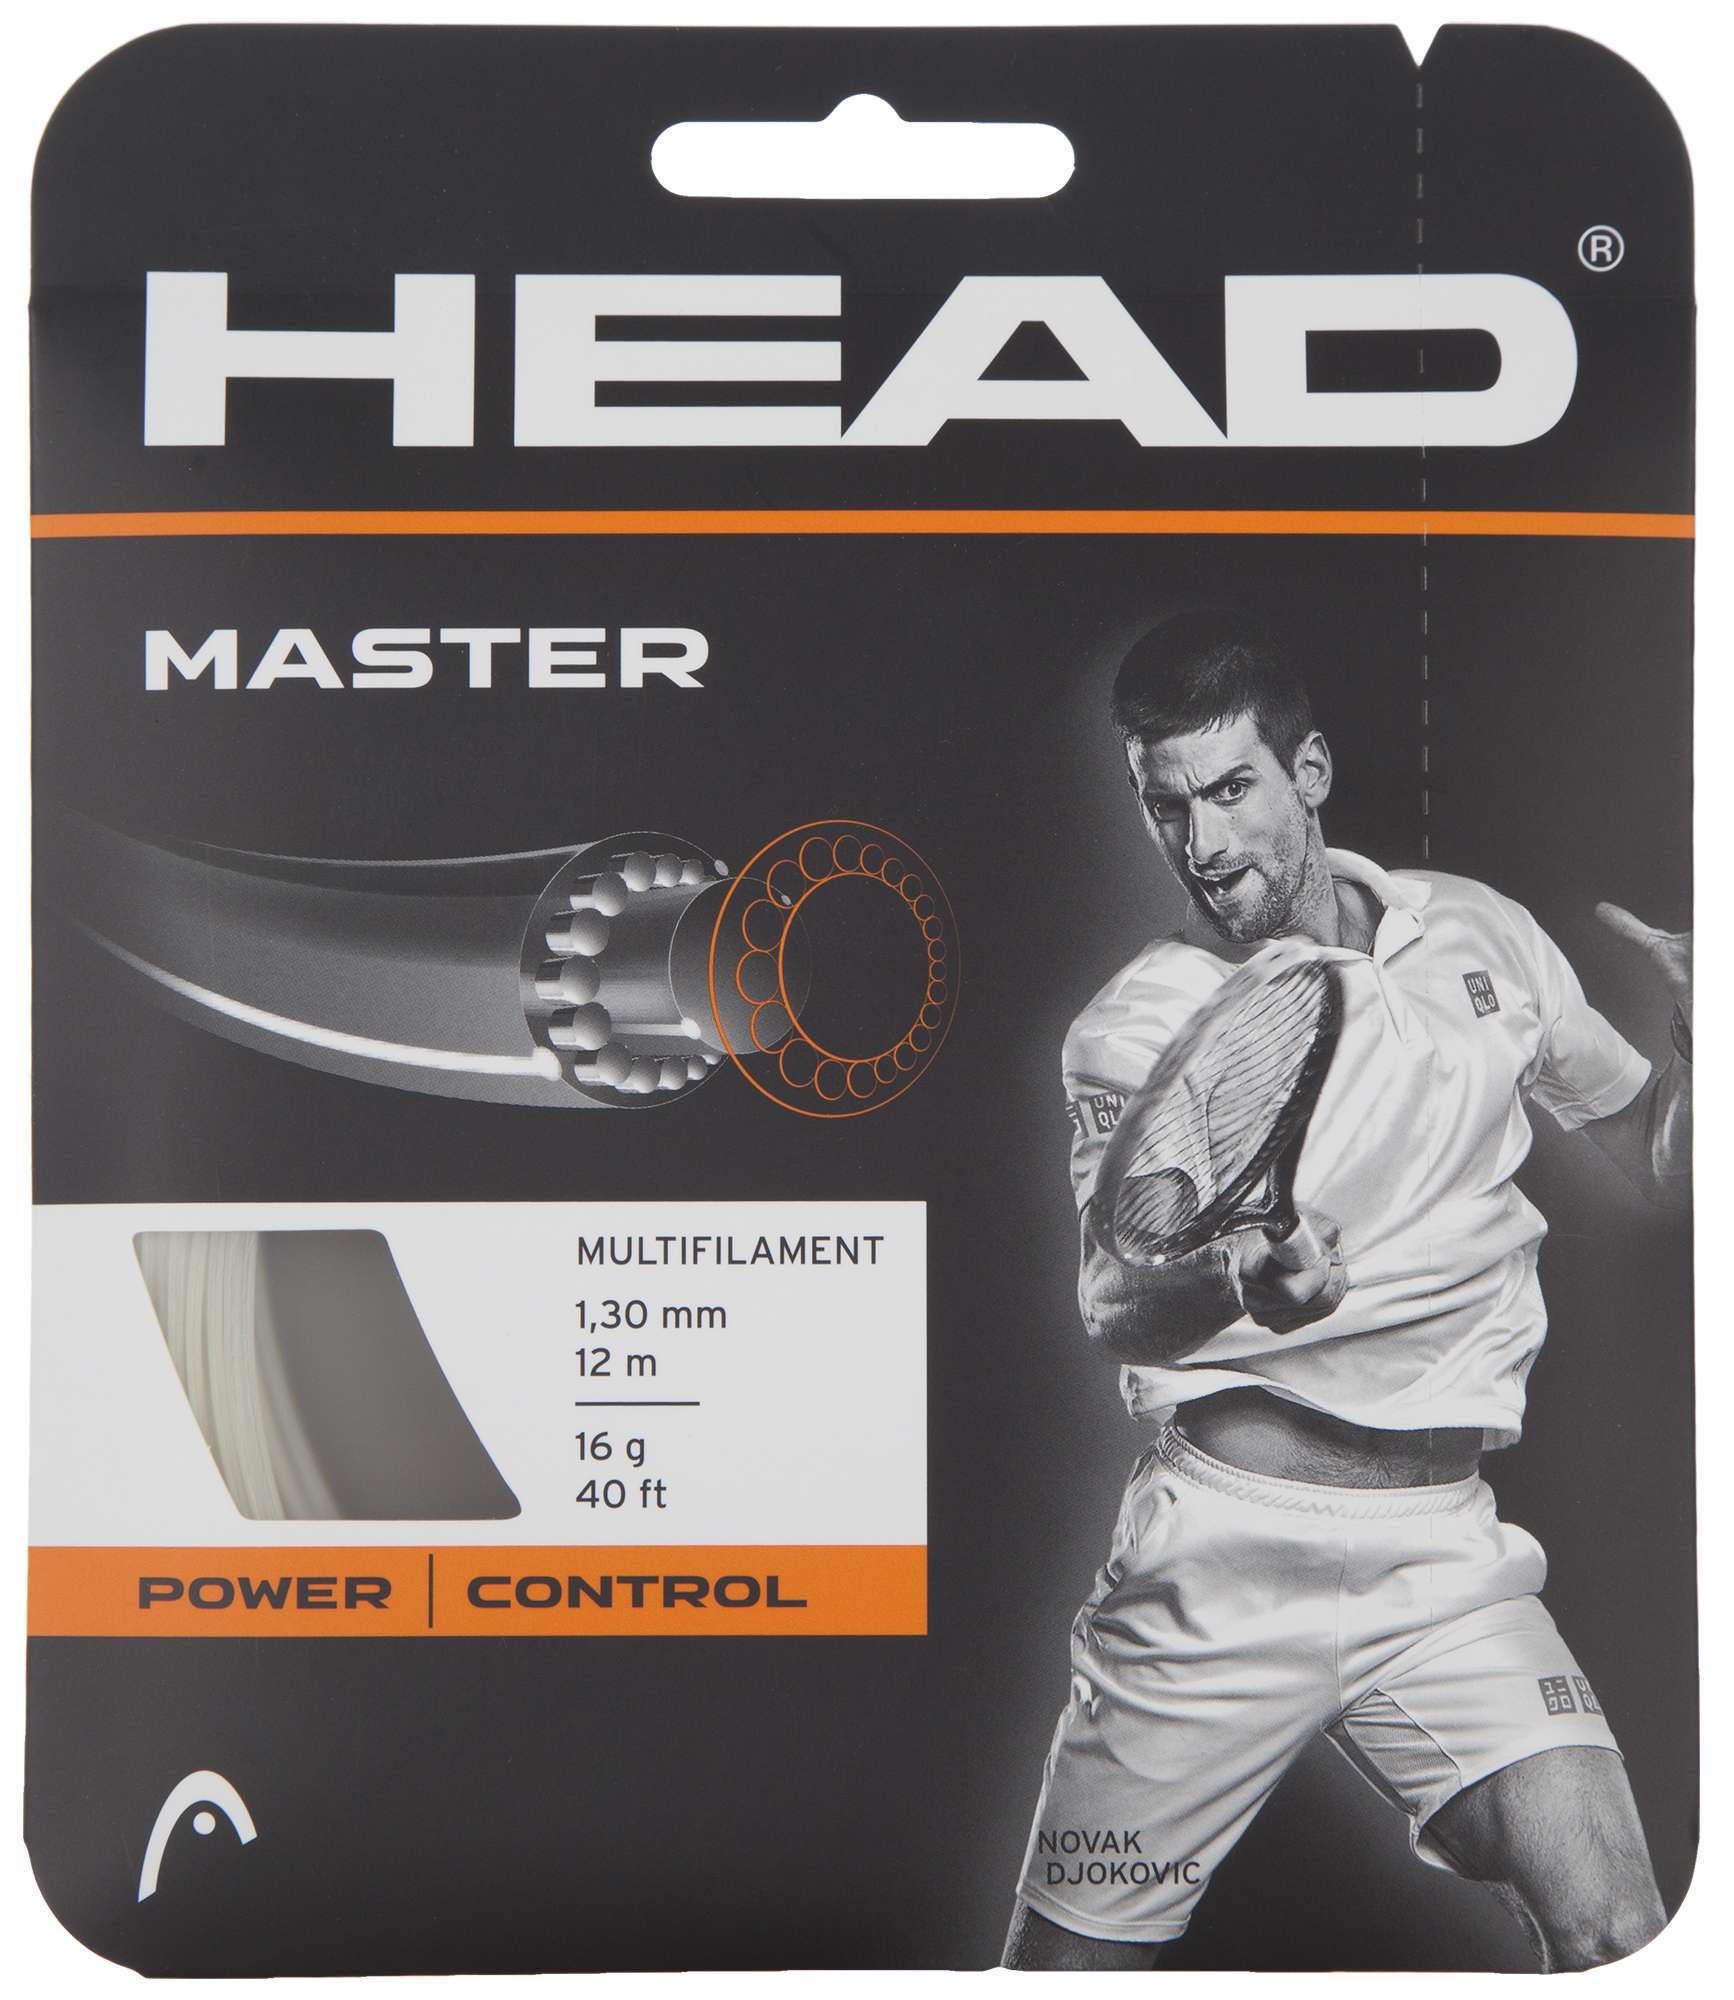 Head Струна Head Master Set струна wilson adrenaline 125 set